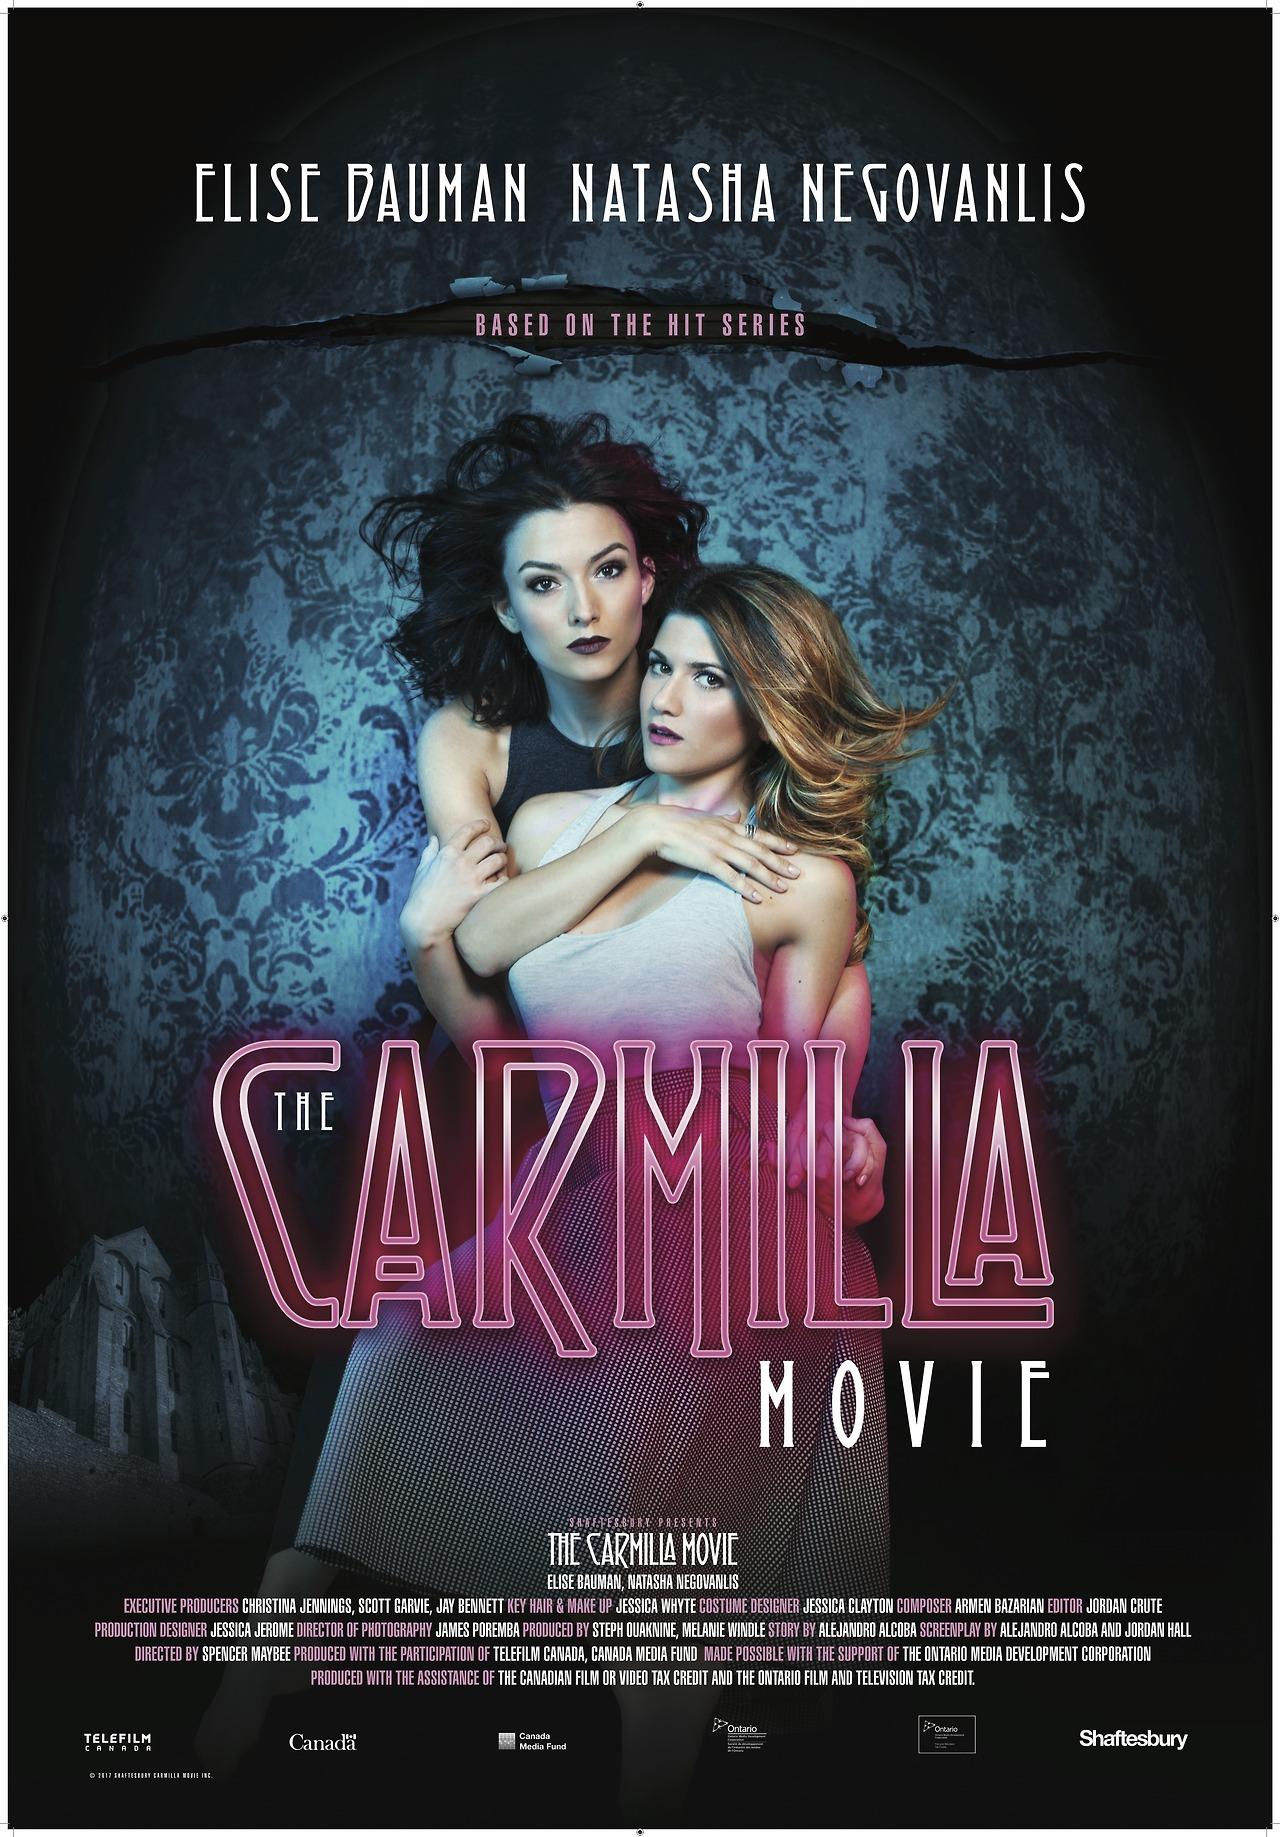 DOWNLOAD KARNSTEIN FILME VAMPIRA GRÁTIS CARMILLA